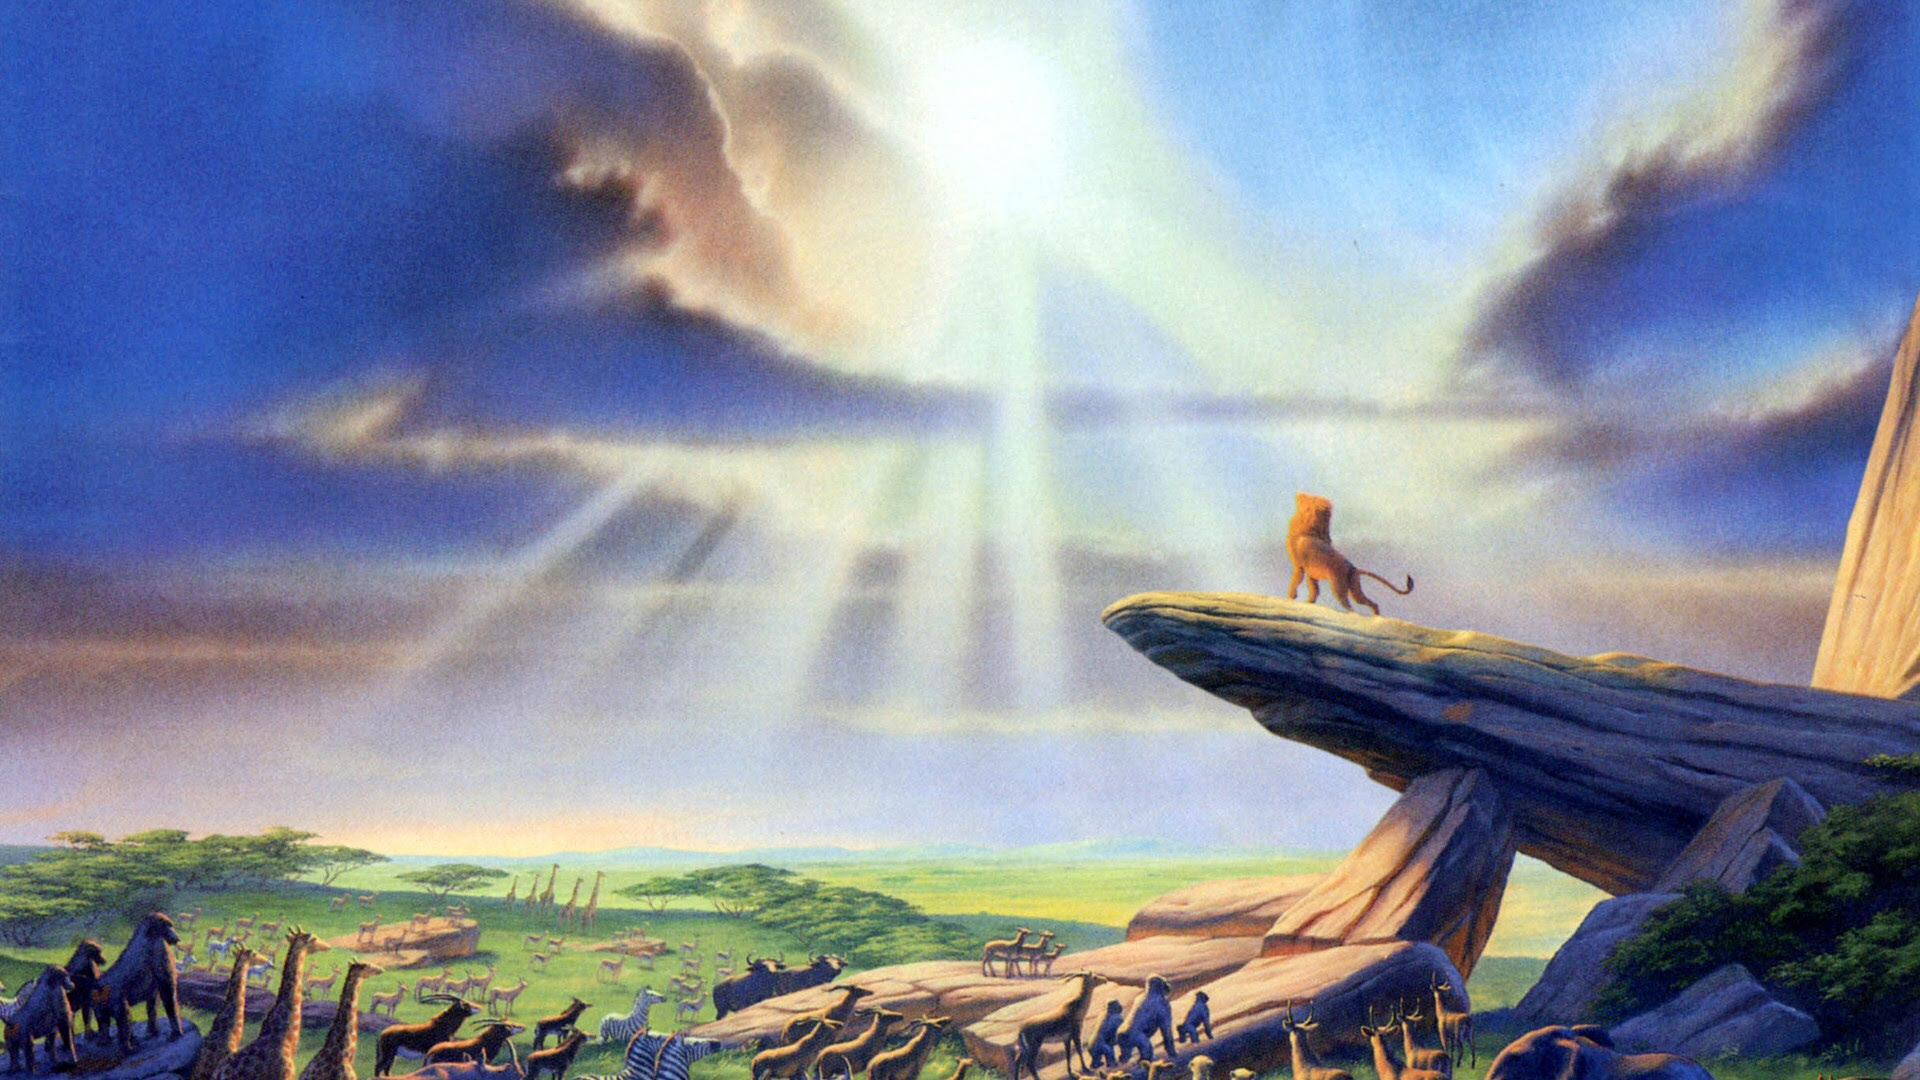 Lion King Desktop Wallpaper